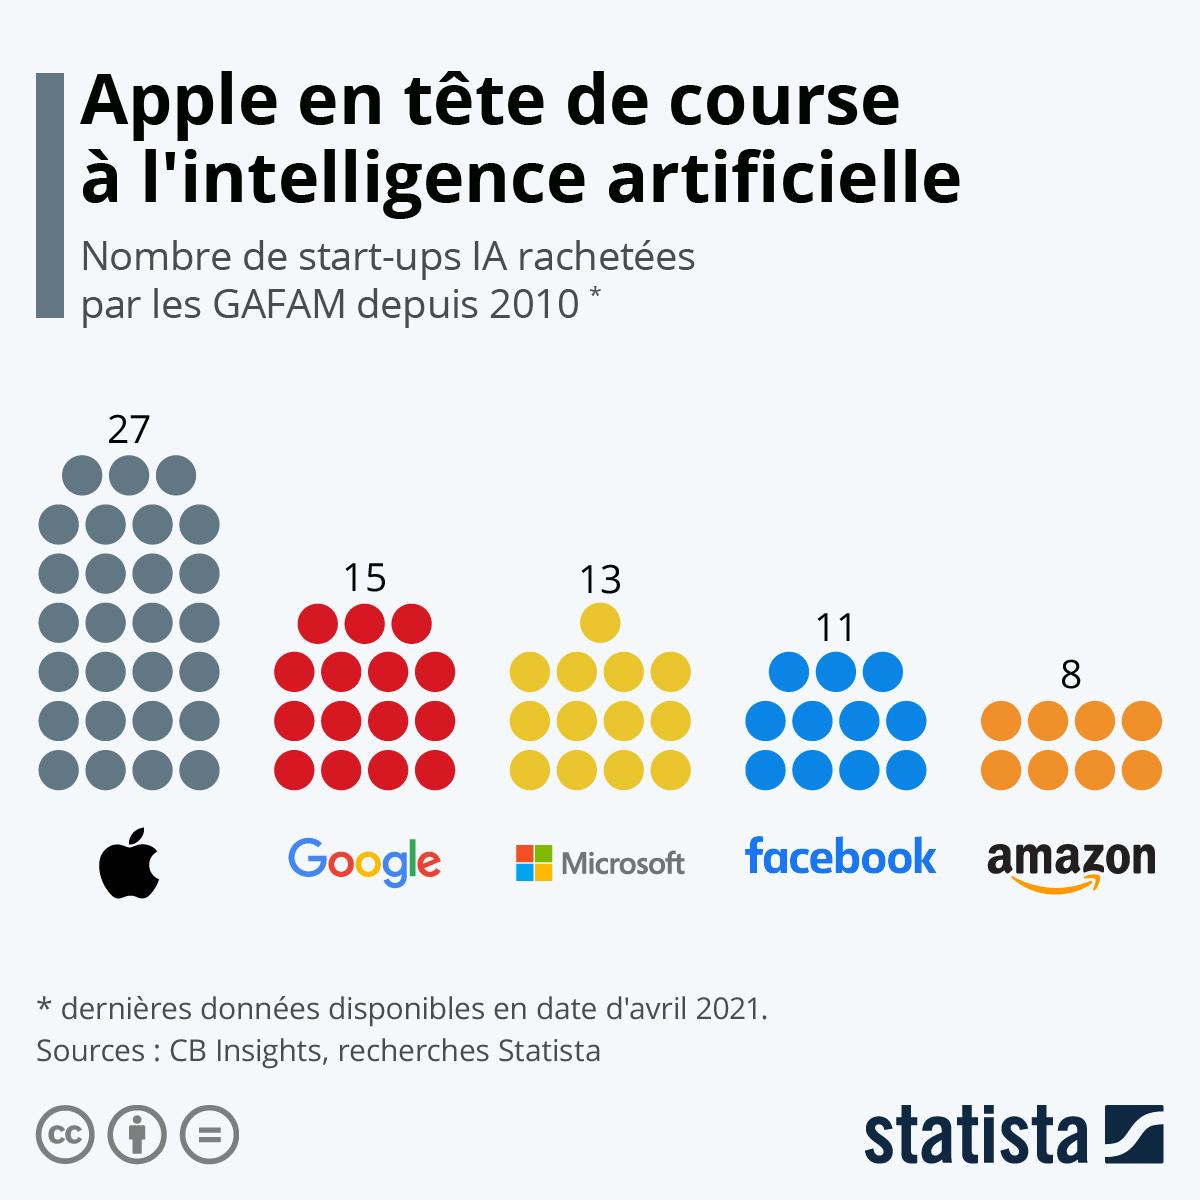 Classements acquisitions startups IA